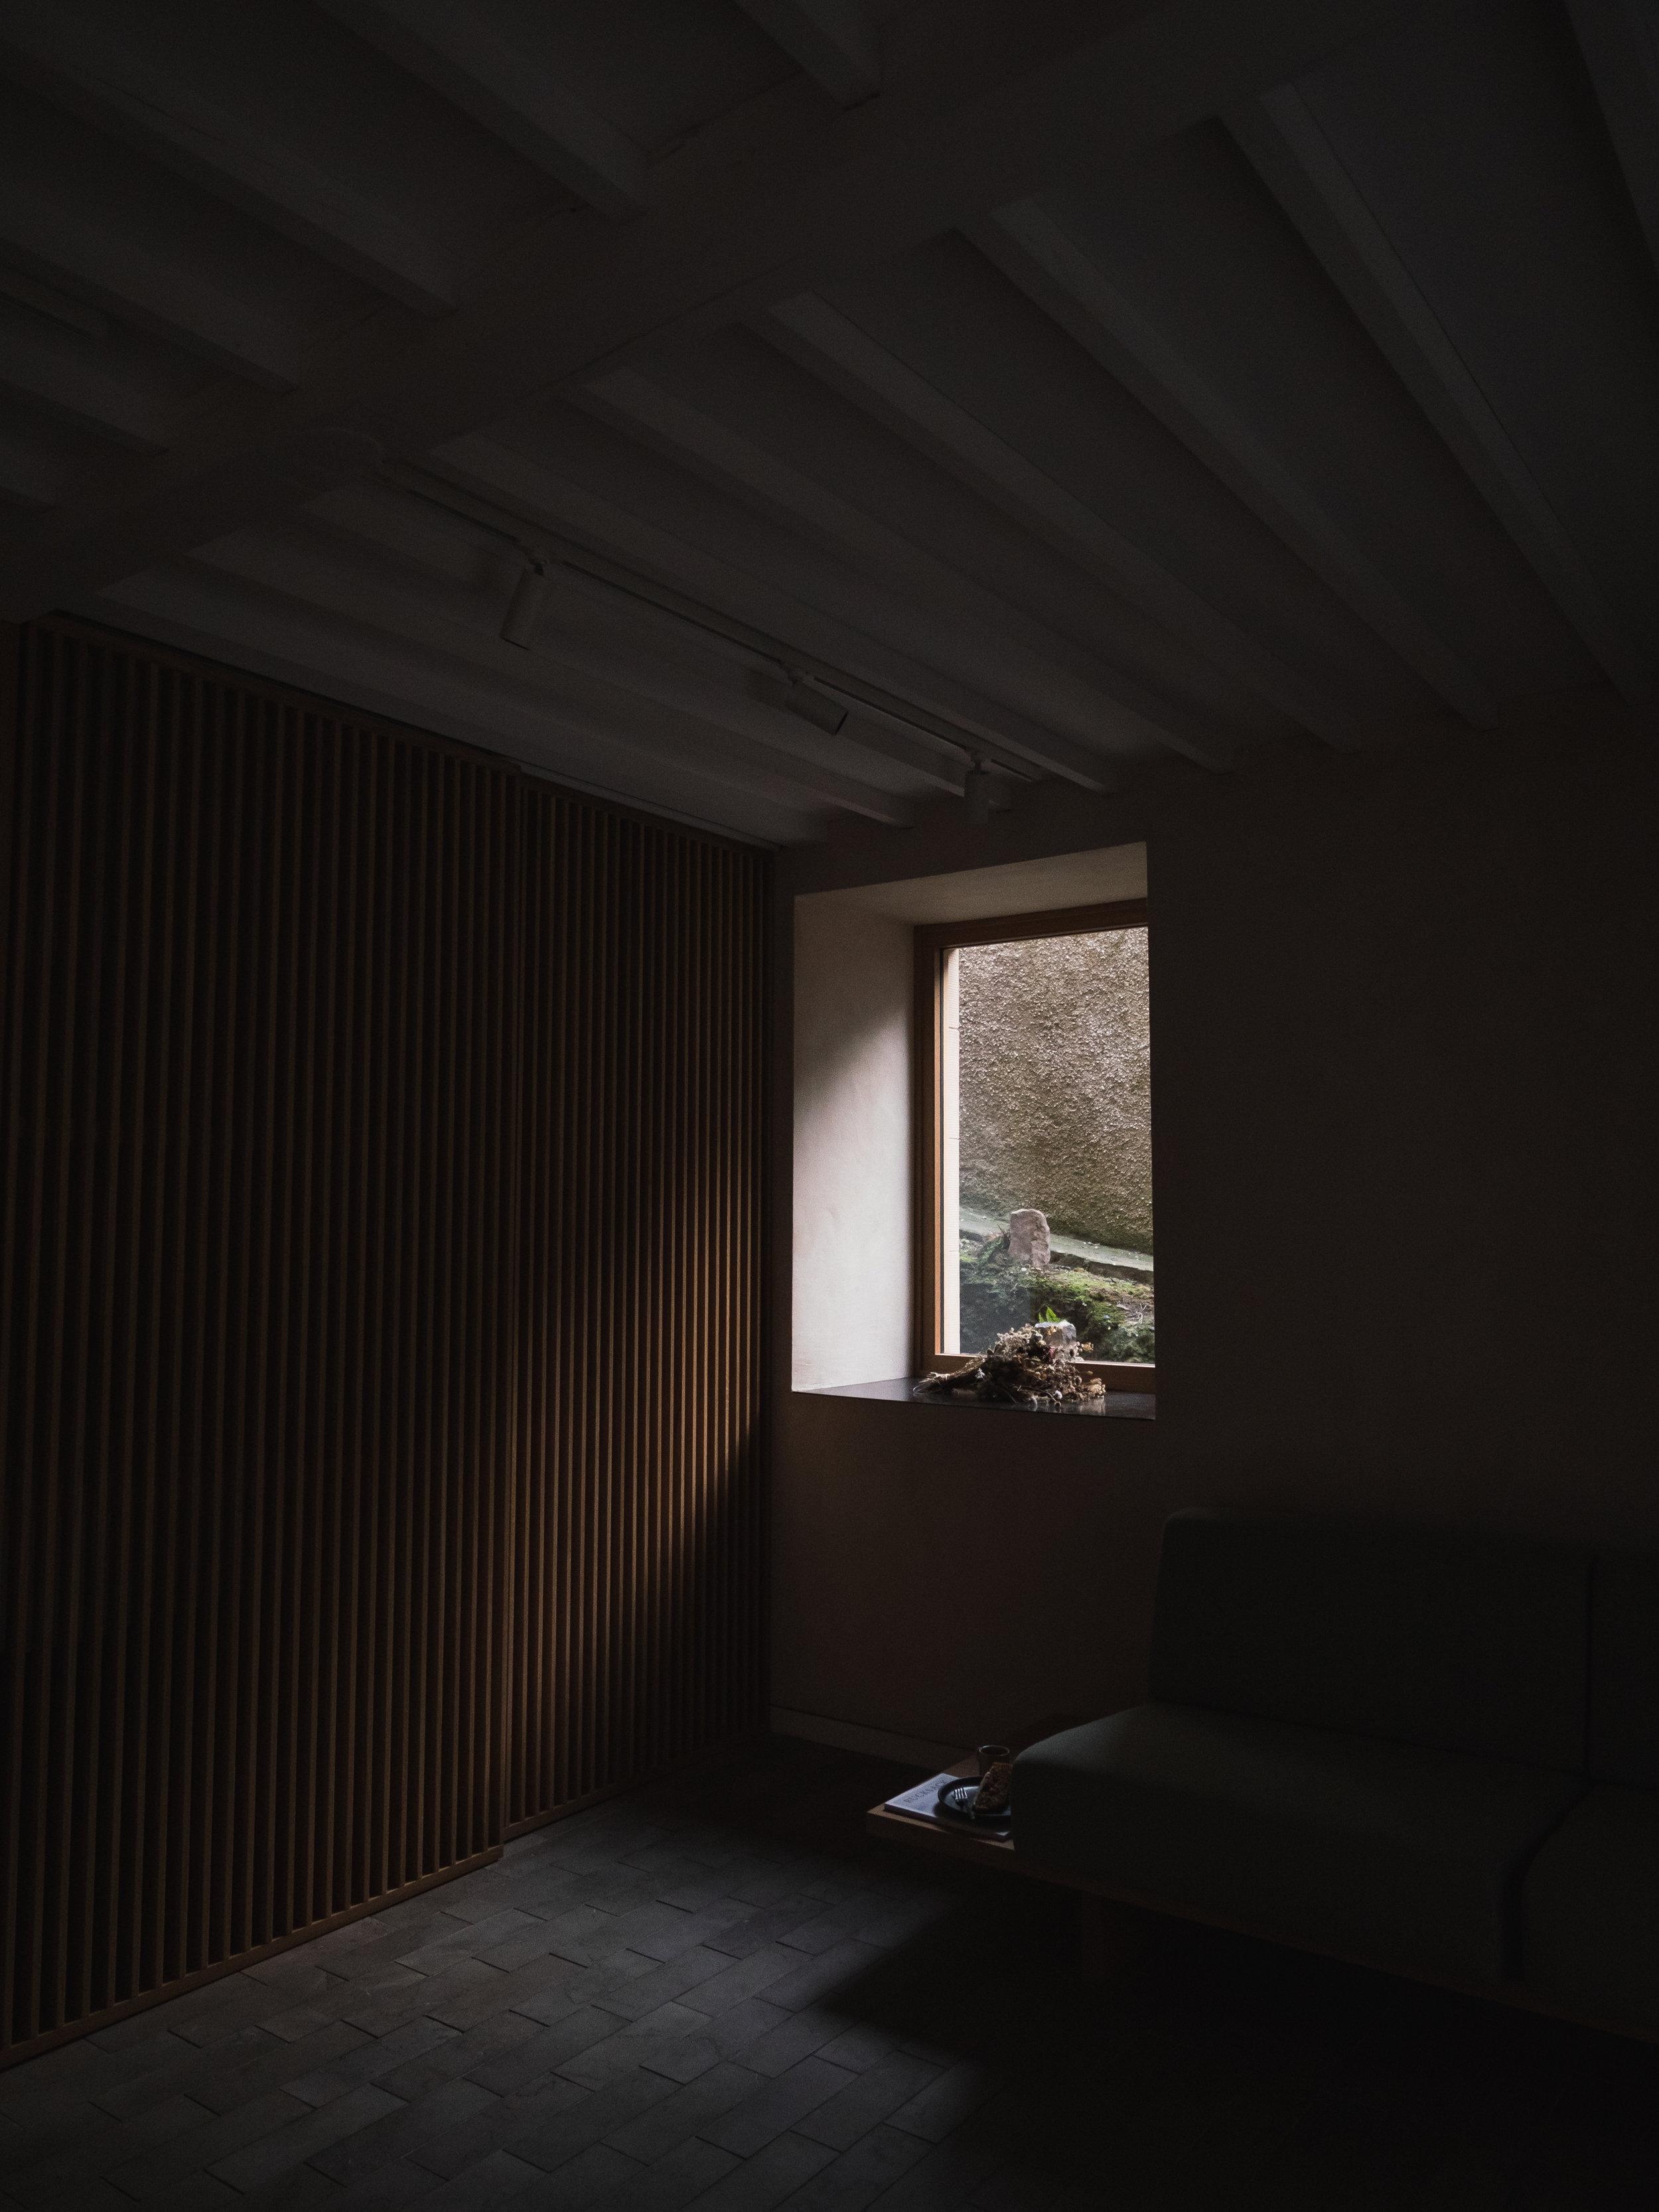 Porteous Studio